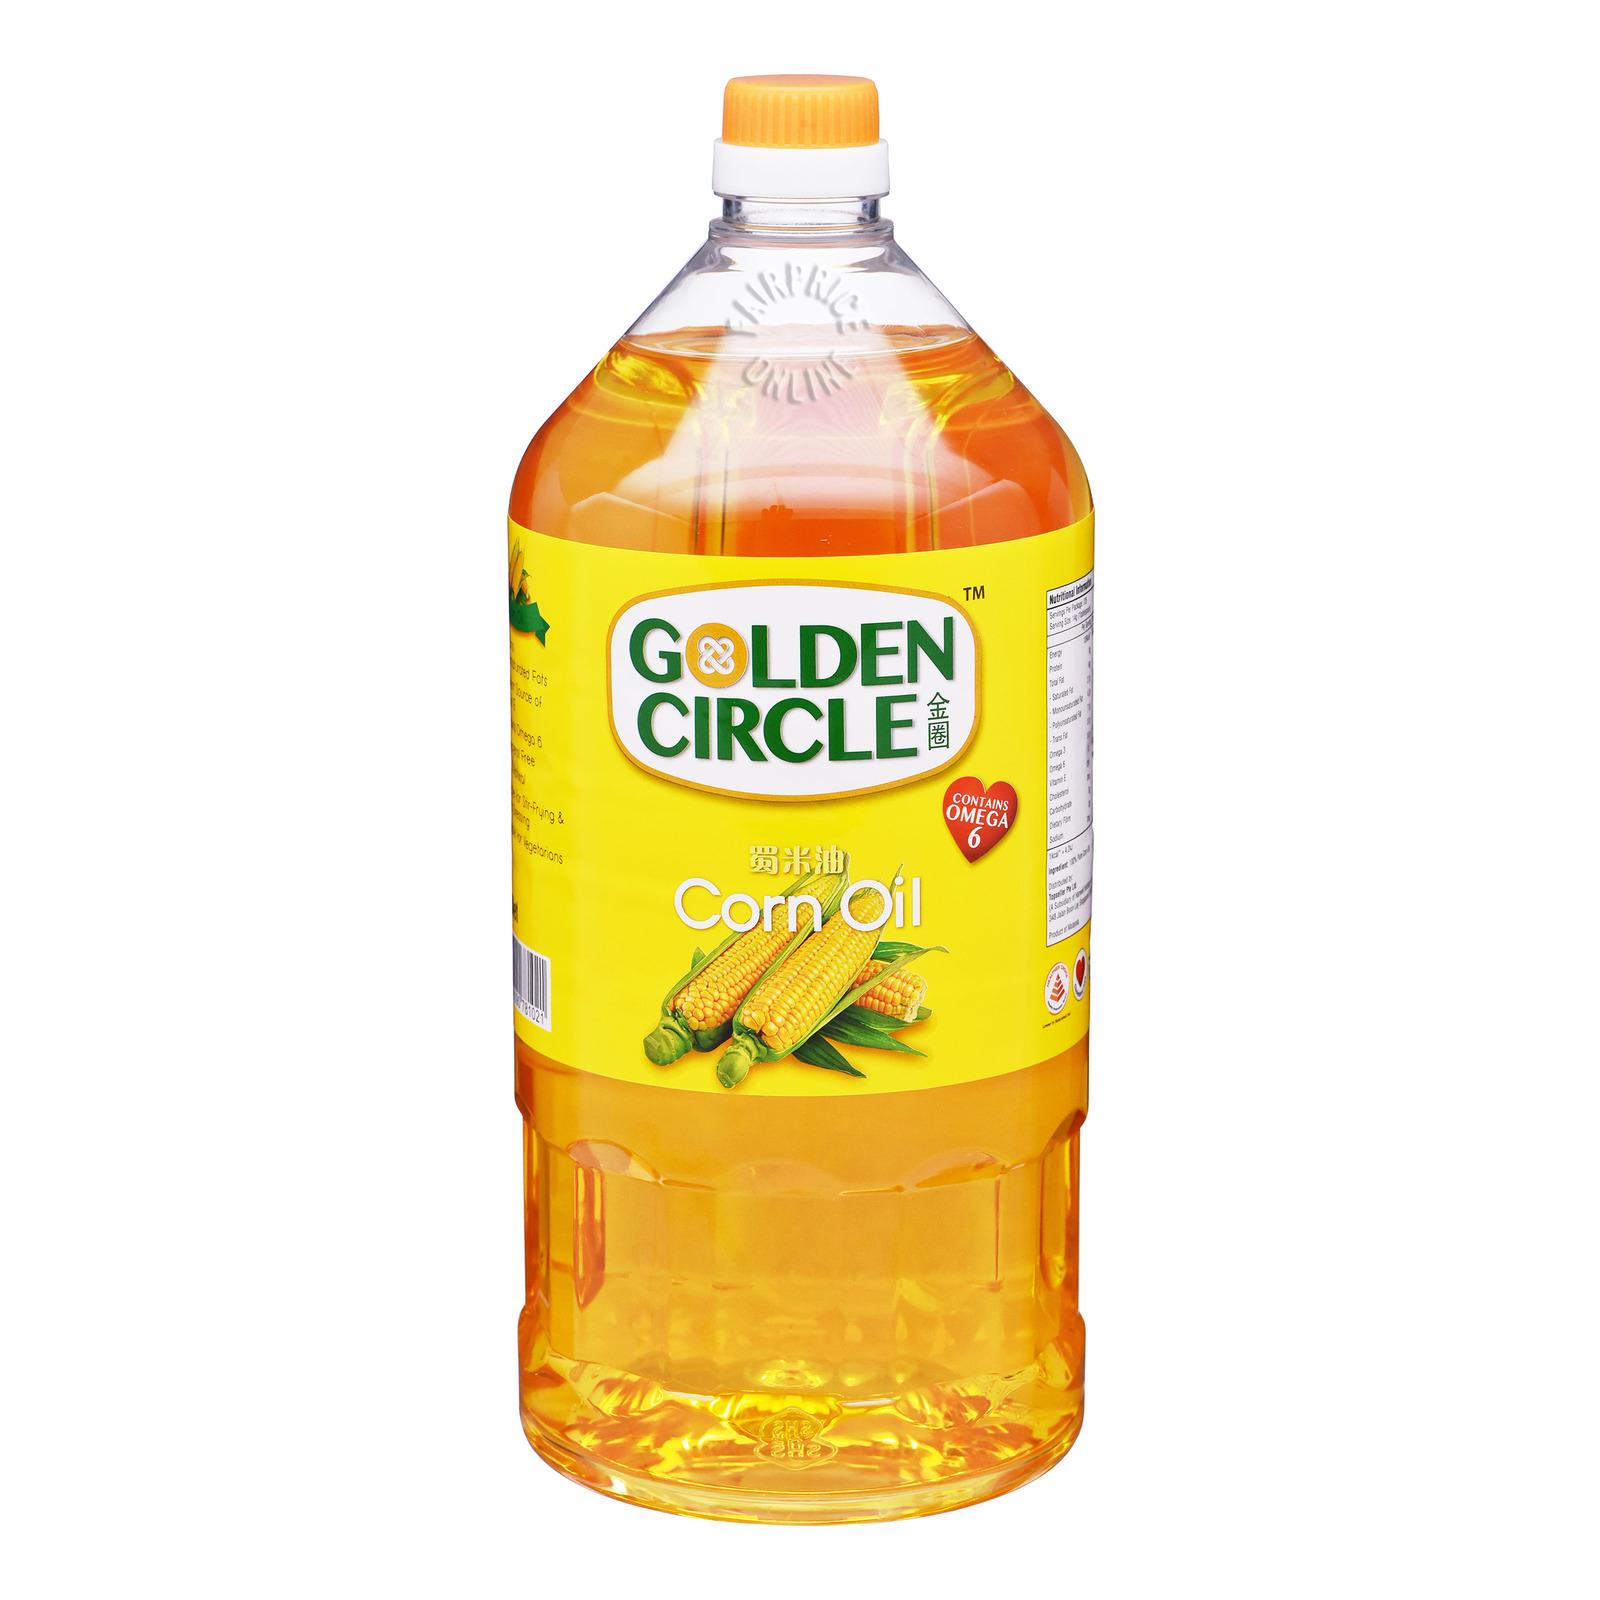 GOLDEN CIRCLE Corn Oil 2L